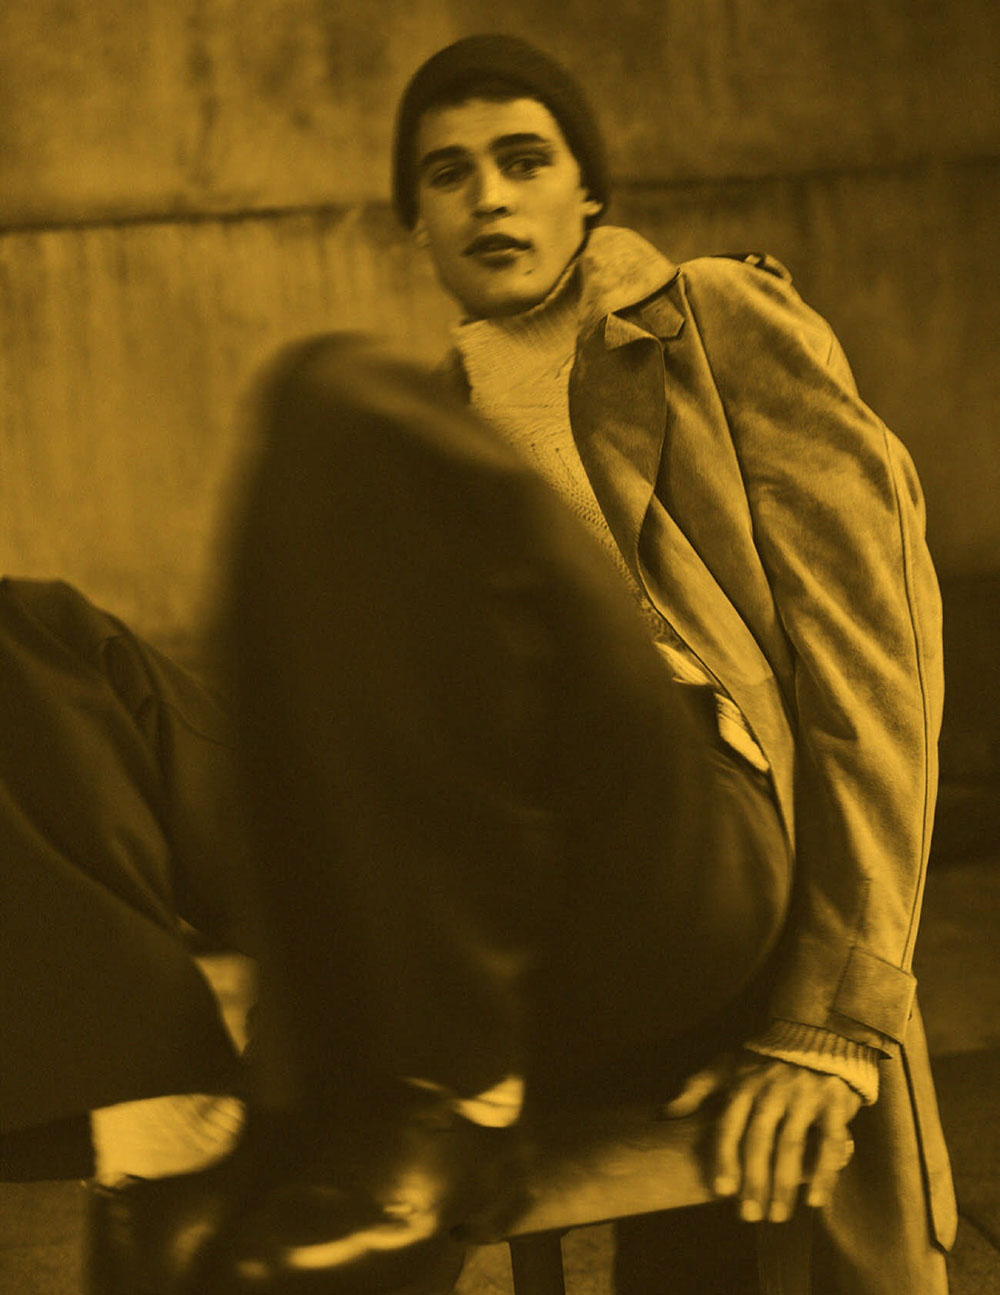 Parker van Noord by Annemarieke van Drimmelen for Vogue Hommes Paris Fall-Winter 2020